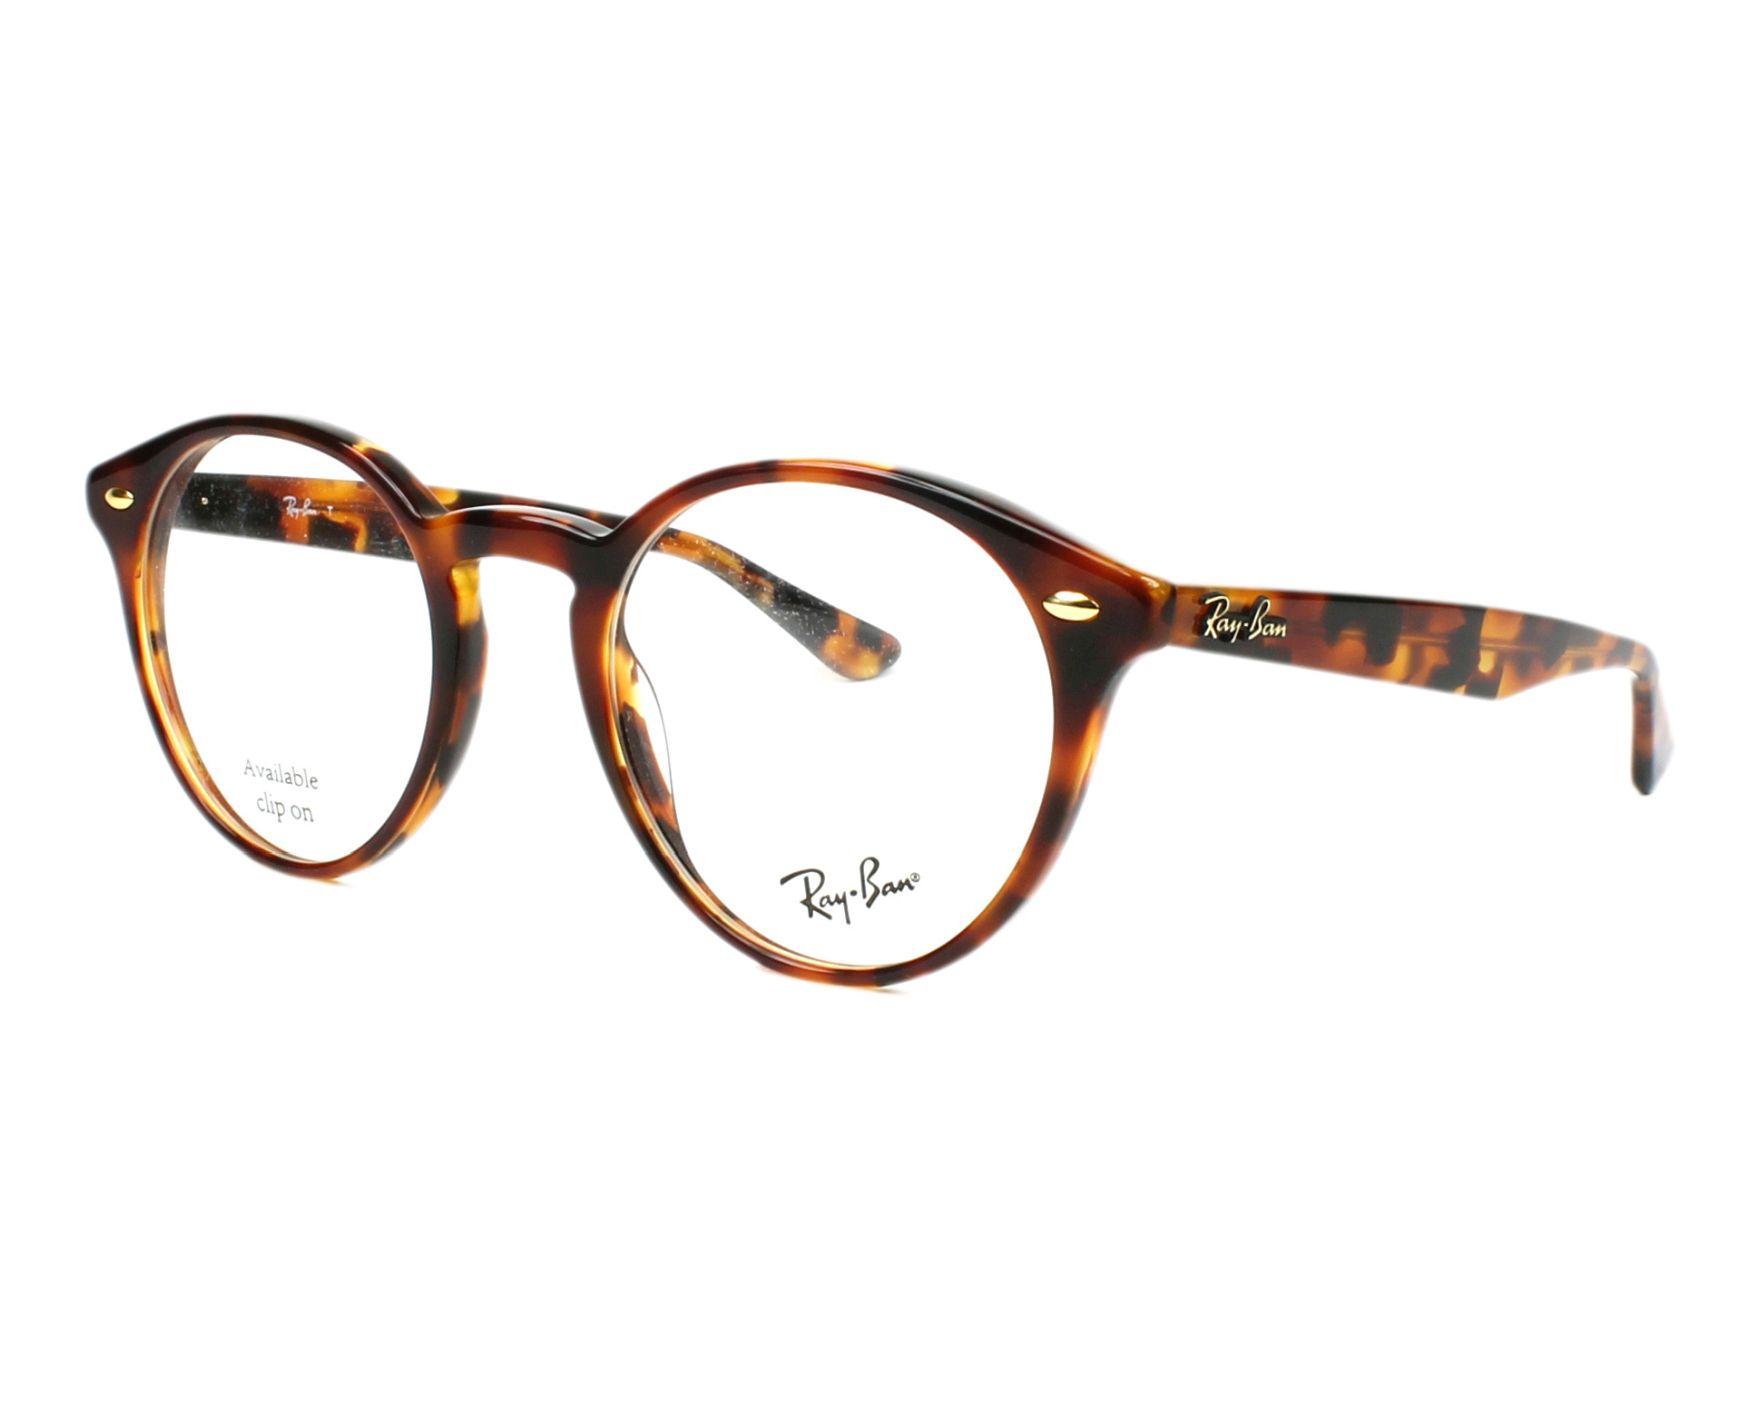 fdf9066056d eyeglasses Ray-Ban RX-2180-V 5675 47-21 Havana profile view